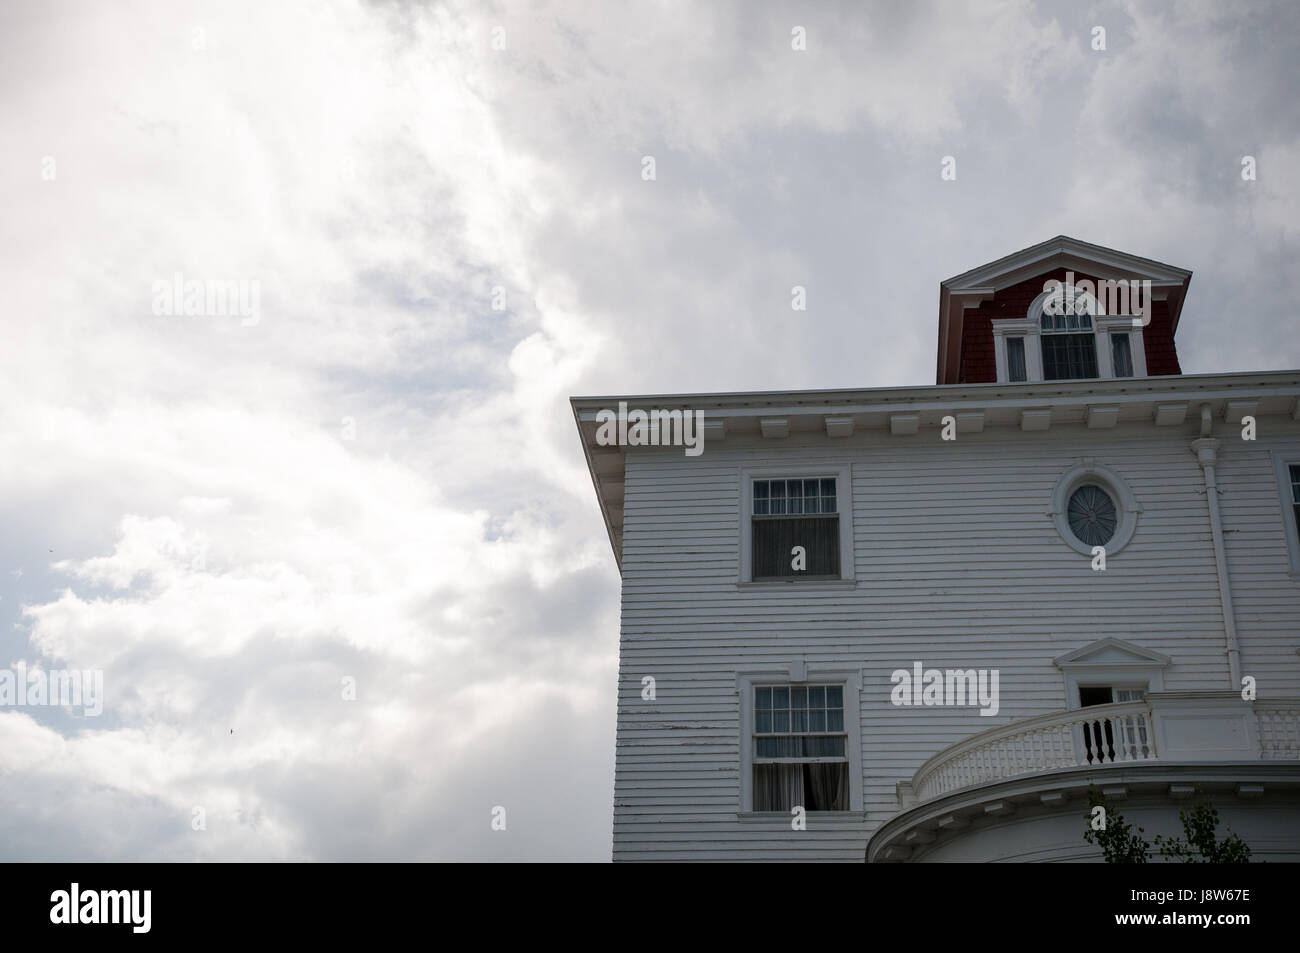 Stanley Hotel, Estes Park, Colorado, USA - Stock Image